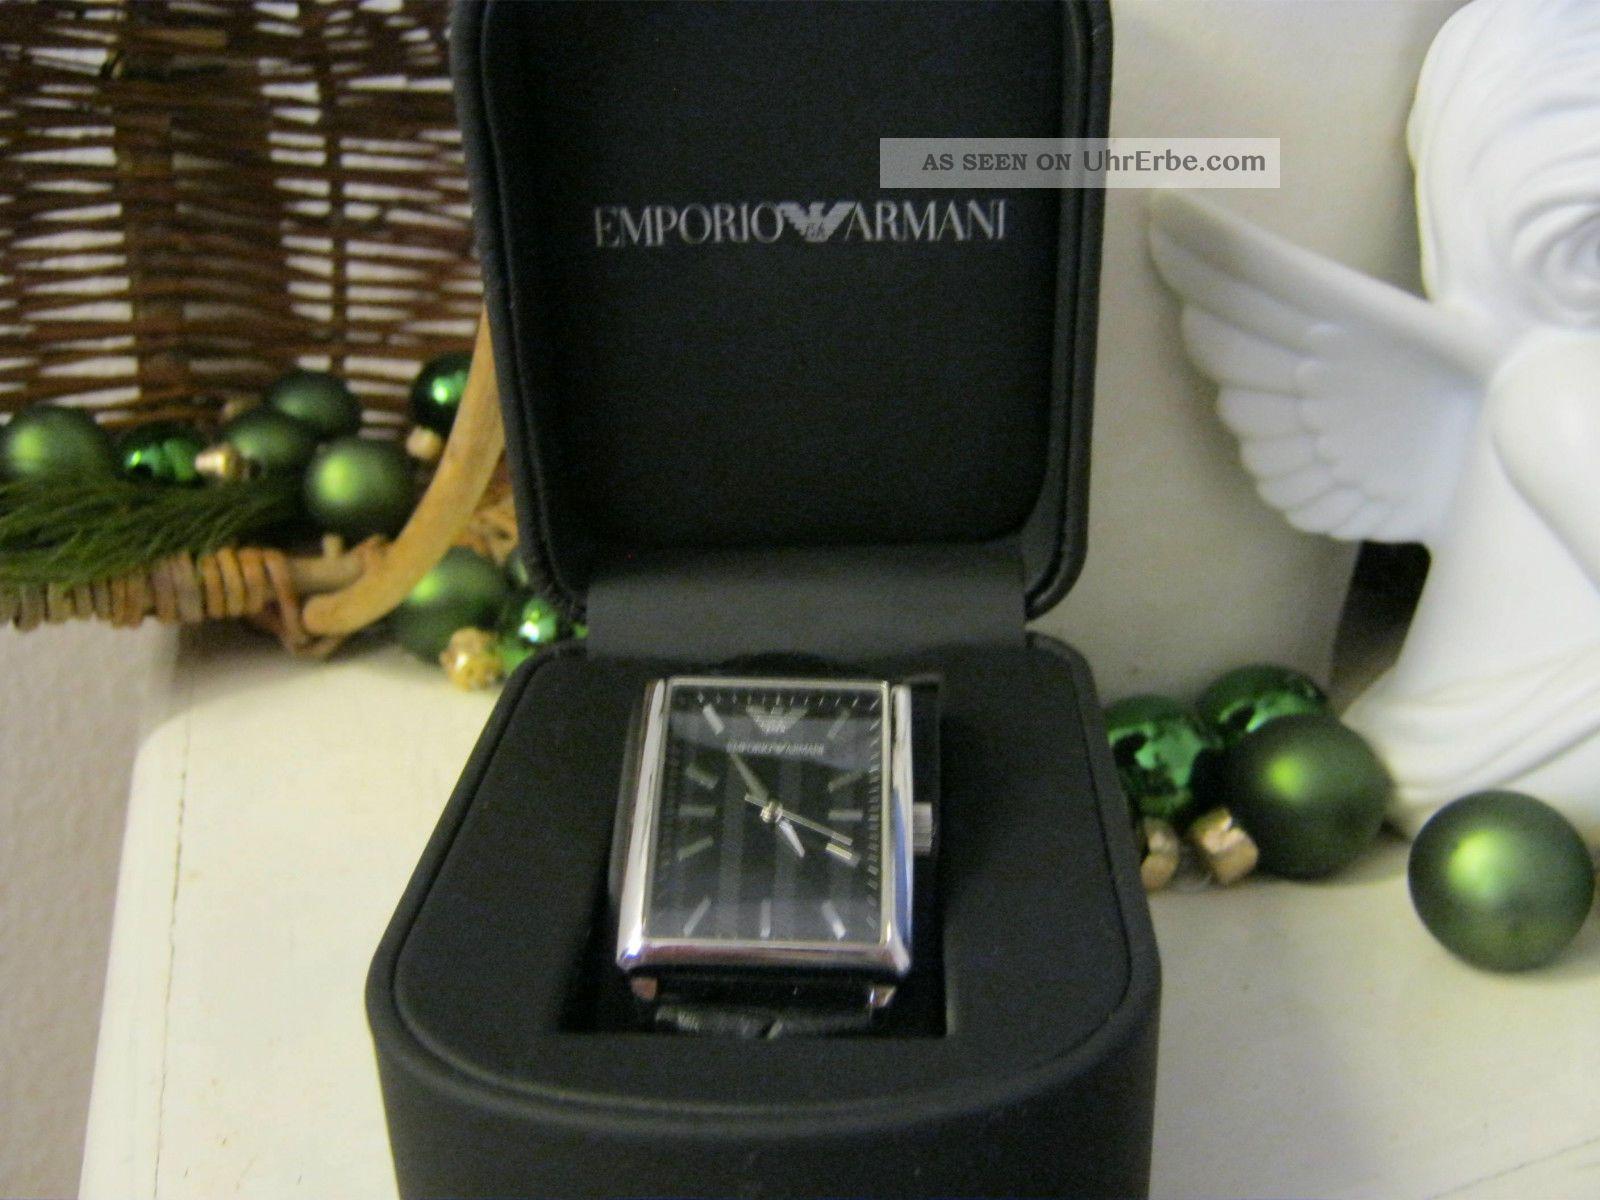 Emporio Armani Armbanduhr Luxusmarke Armbanduhren Bild